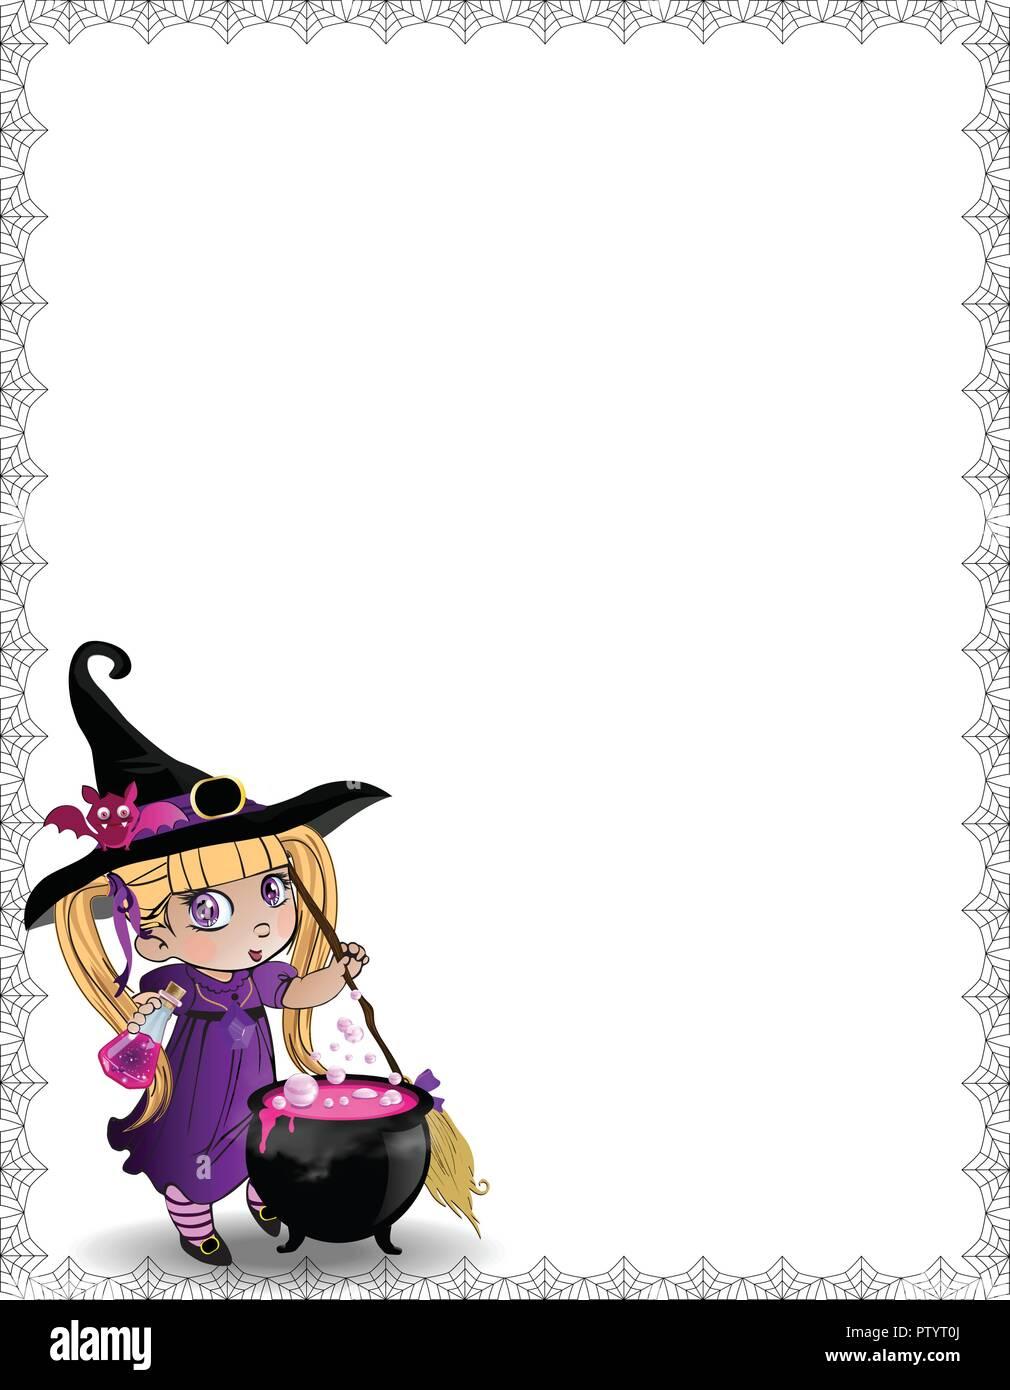 Vector Illustration De Peu Kawaii Bébé Fille Sorcière Avec